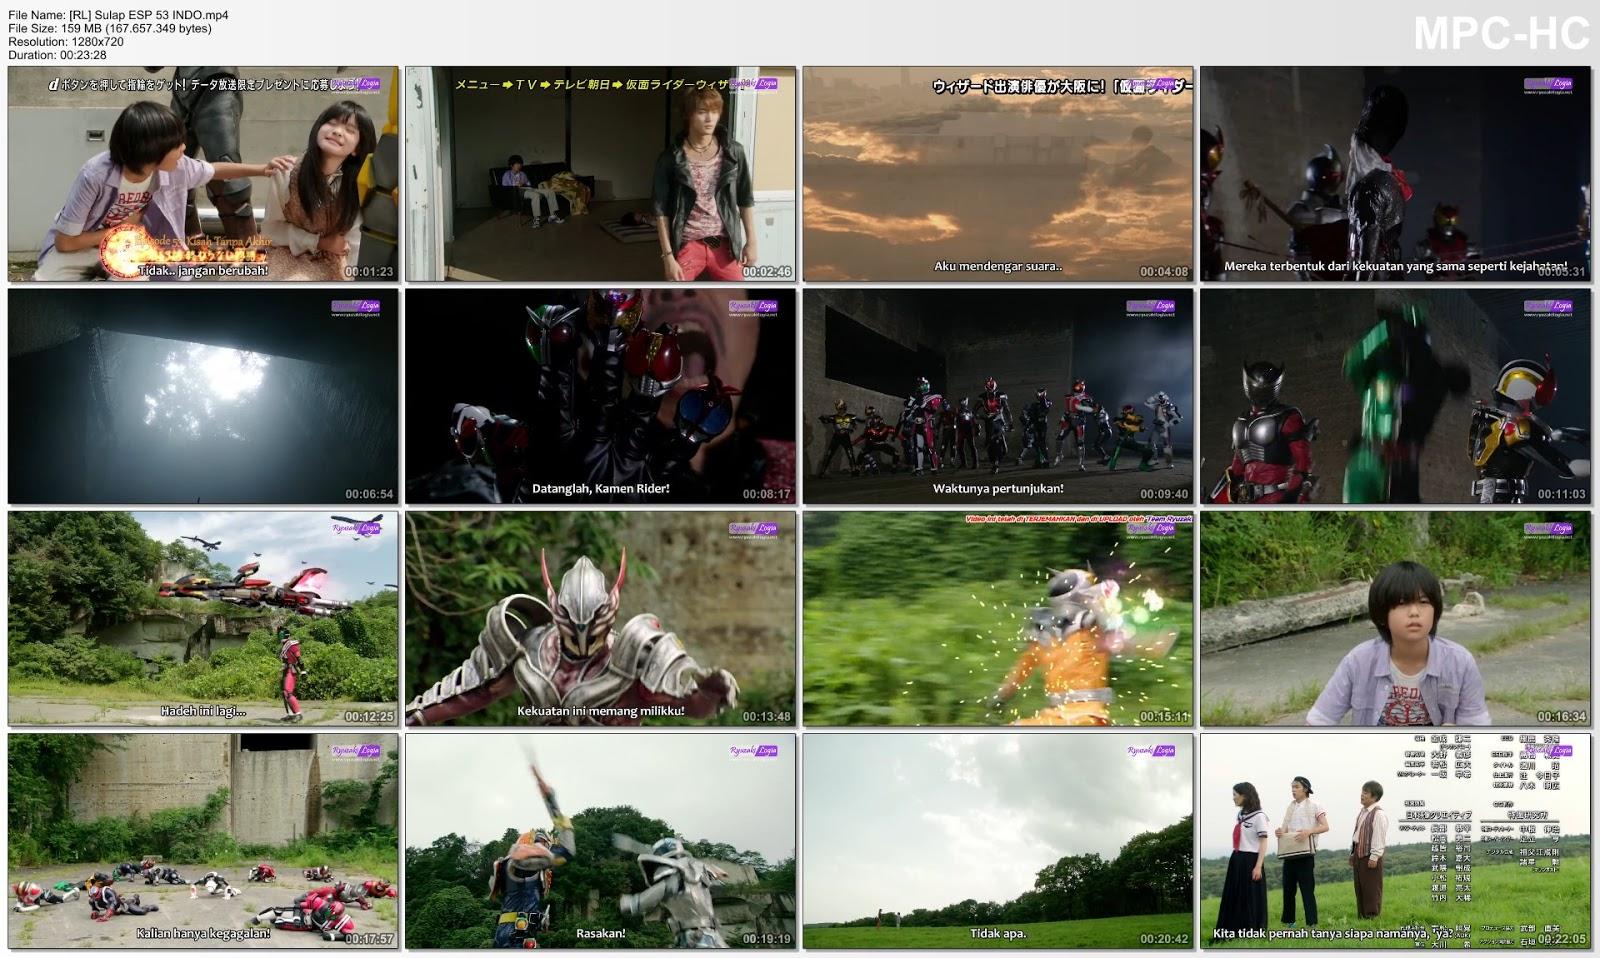 Special] Kamen Rider Wizard Episode 52&53 Subtitle Indonesia